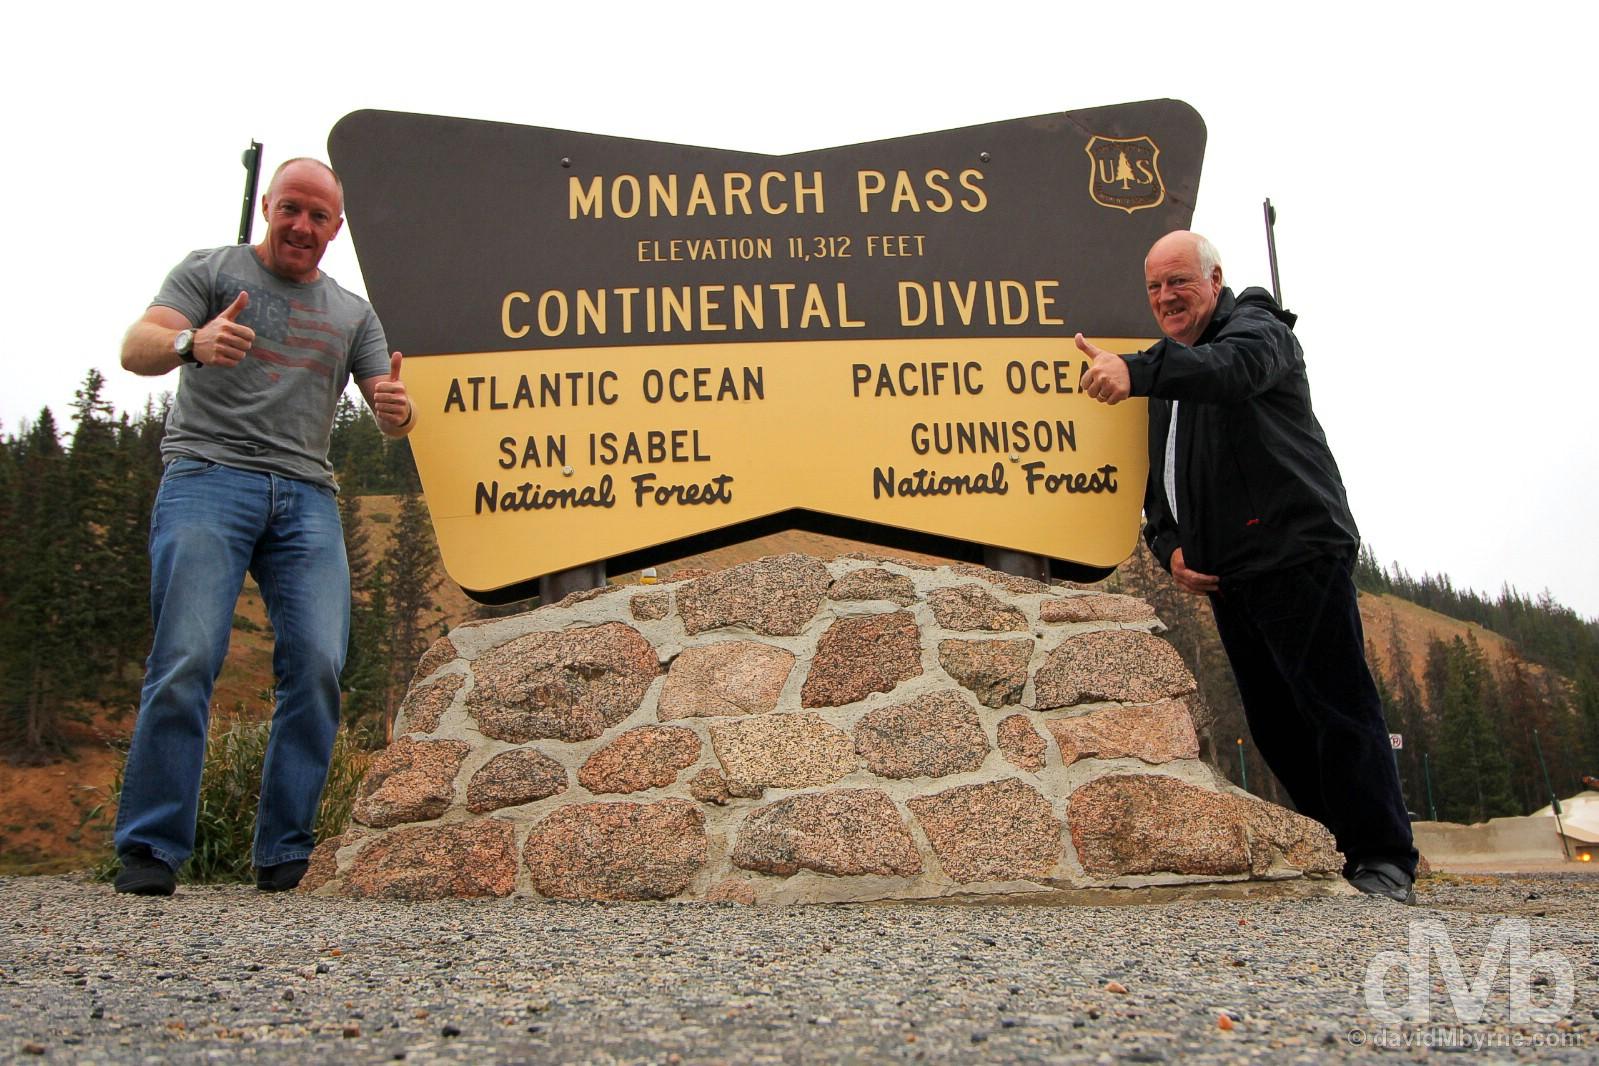 Monarch Pass, south-central Colorado, USA. September 12, 2016.